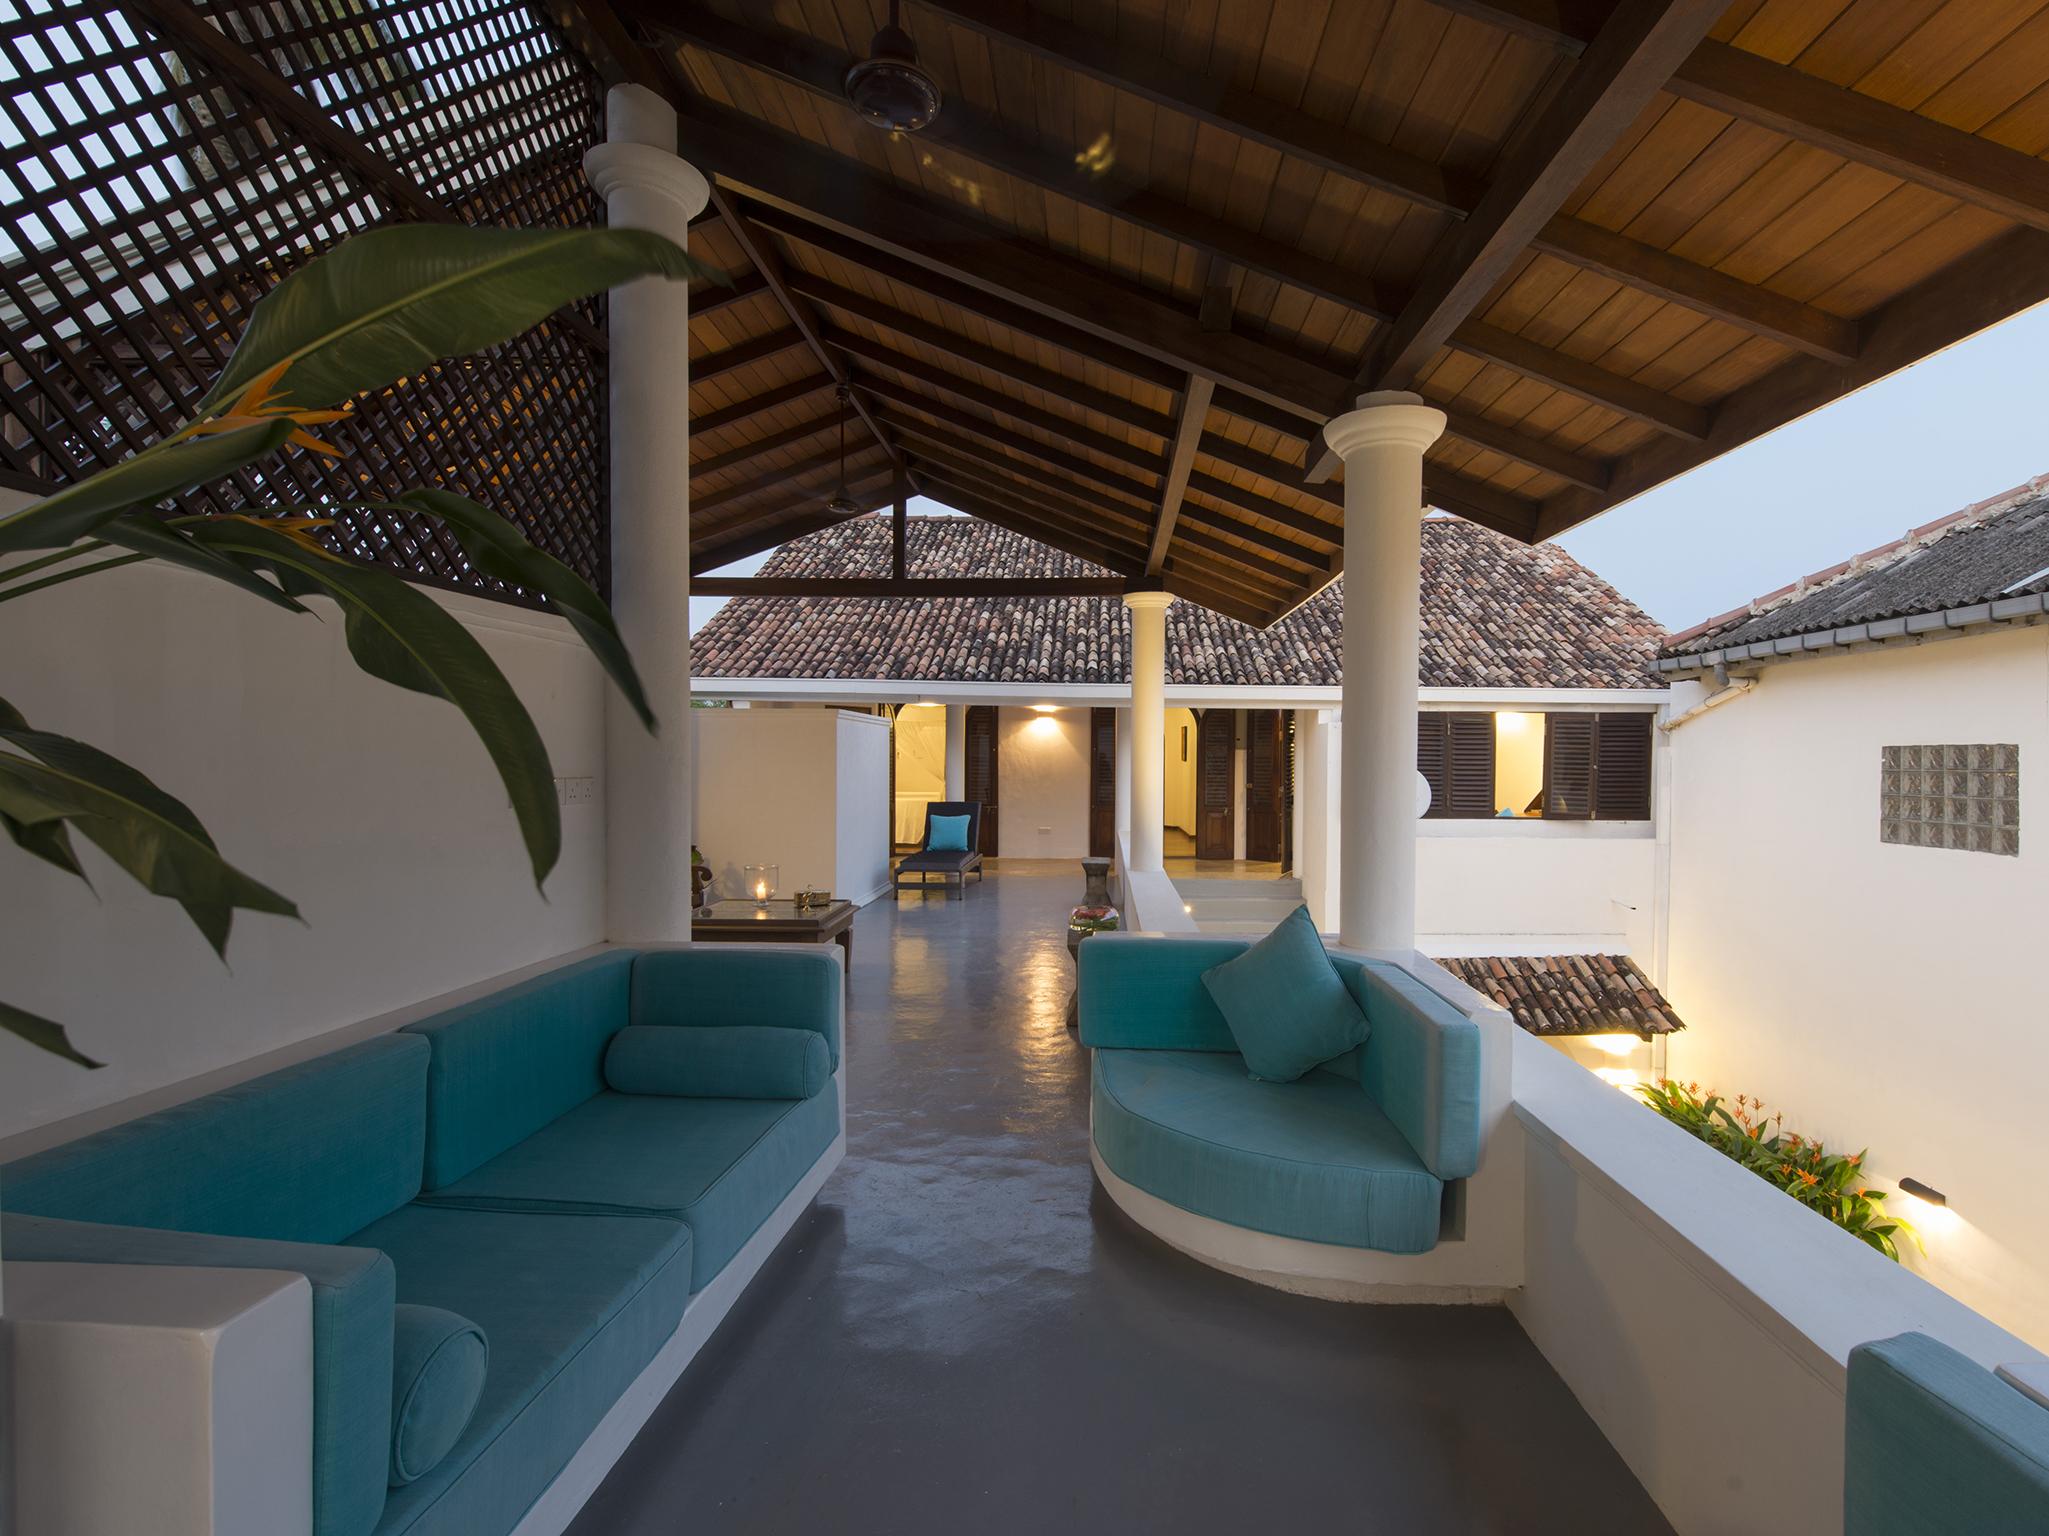 07-Ambassadors House-Galle - Roof terrace sitting area.jpg